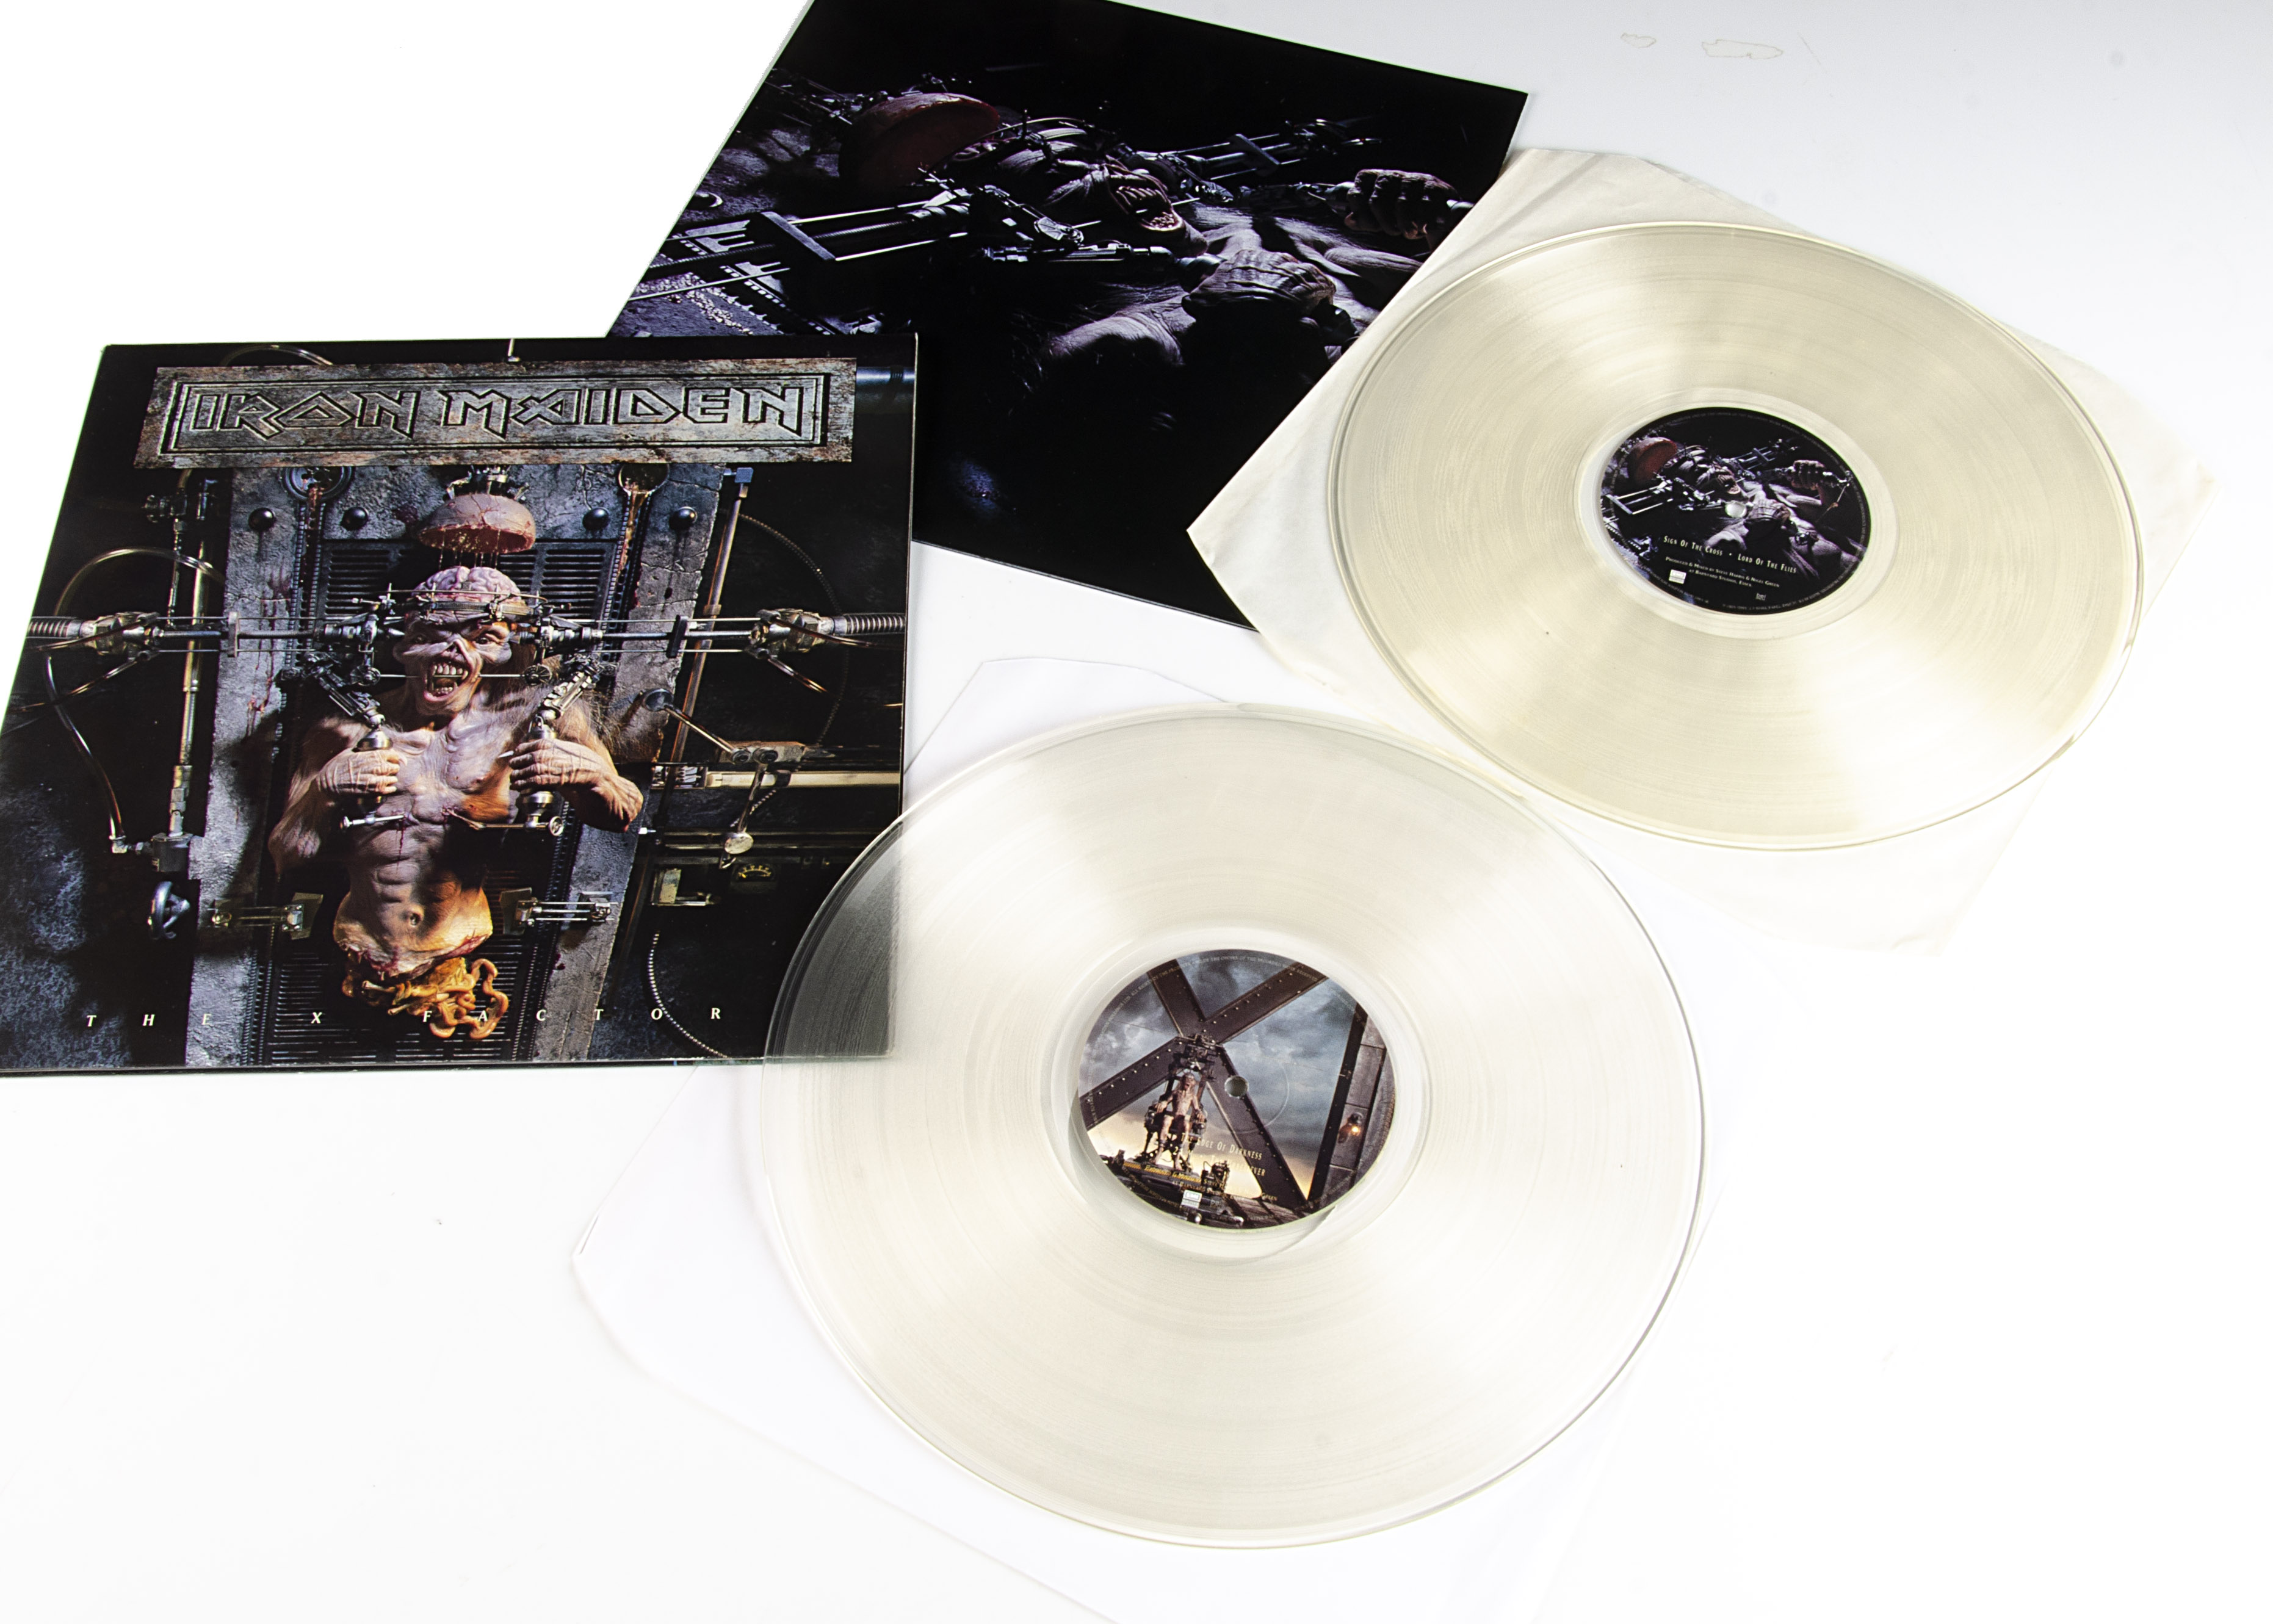 Iron Maiden LP, The X Factor Double Album - UK Clear Vinyl release 1995 on EMI (EMD 1087) - Gatefold